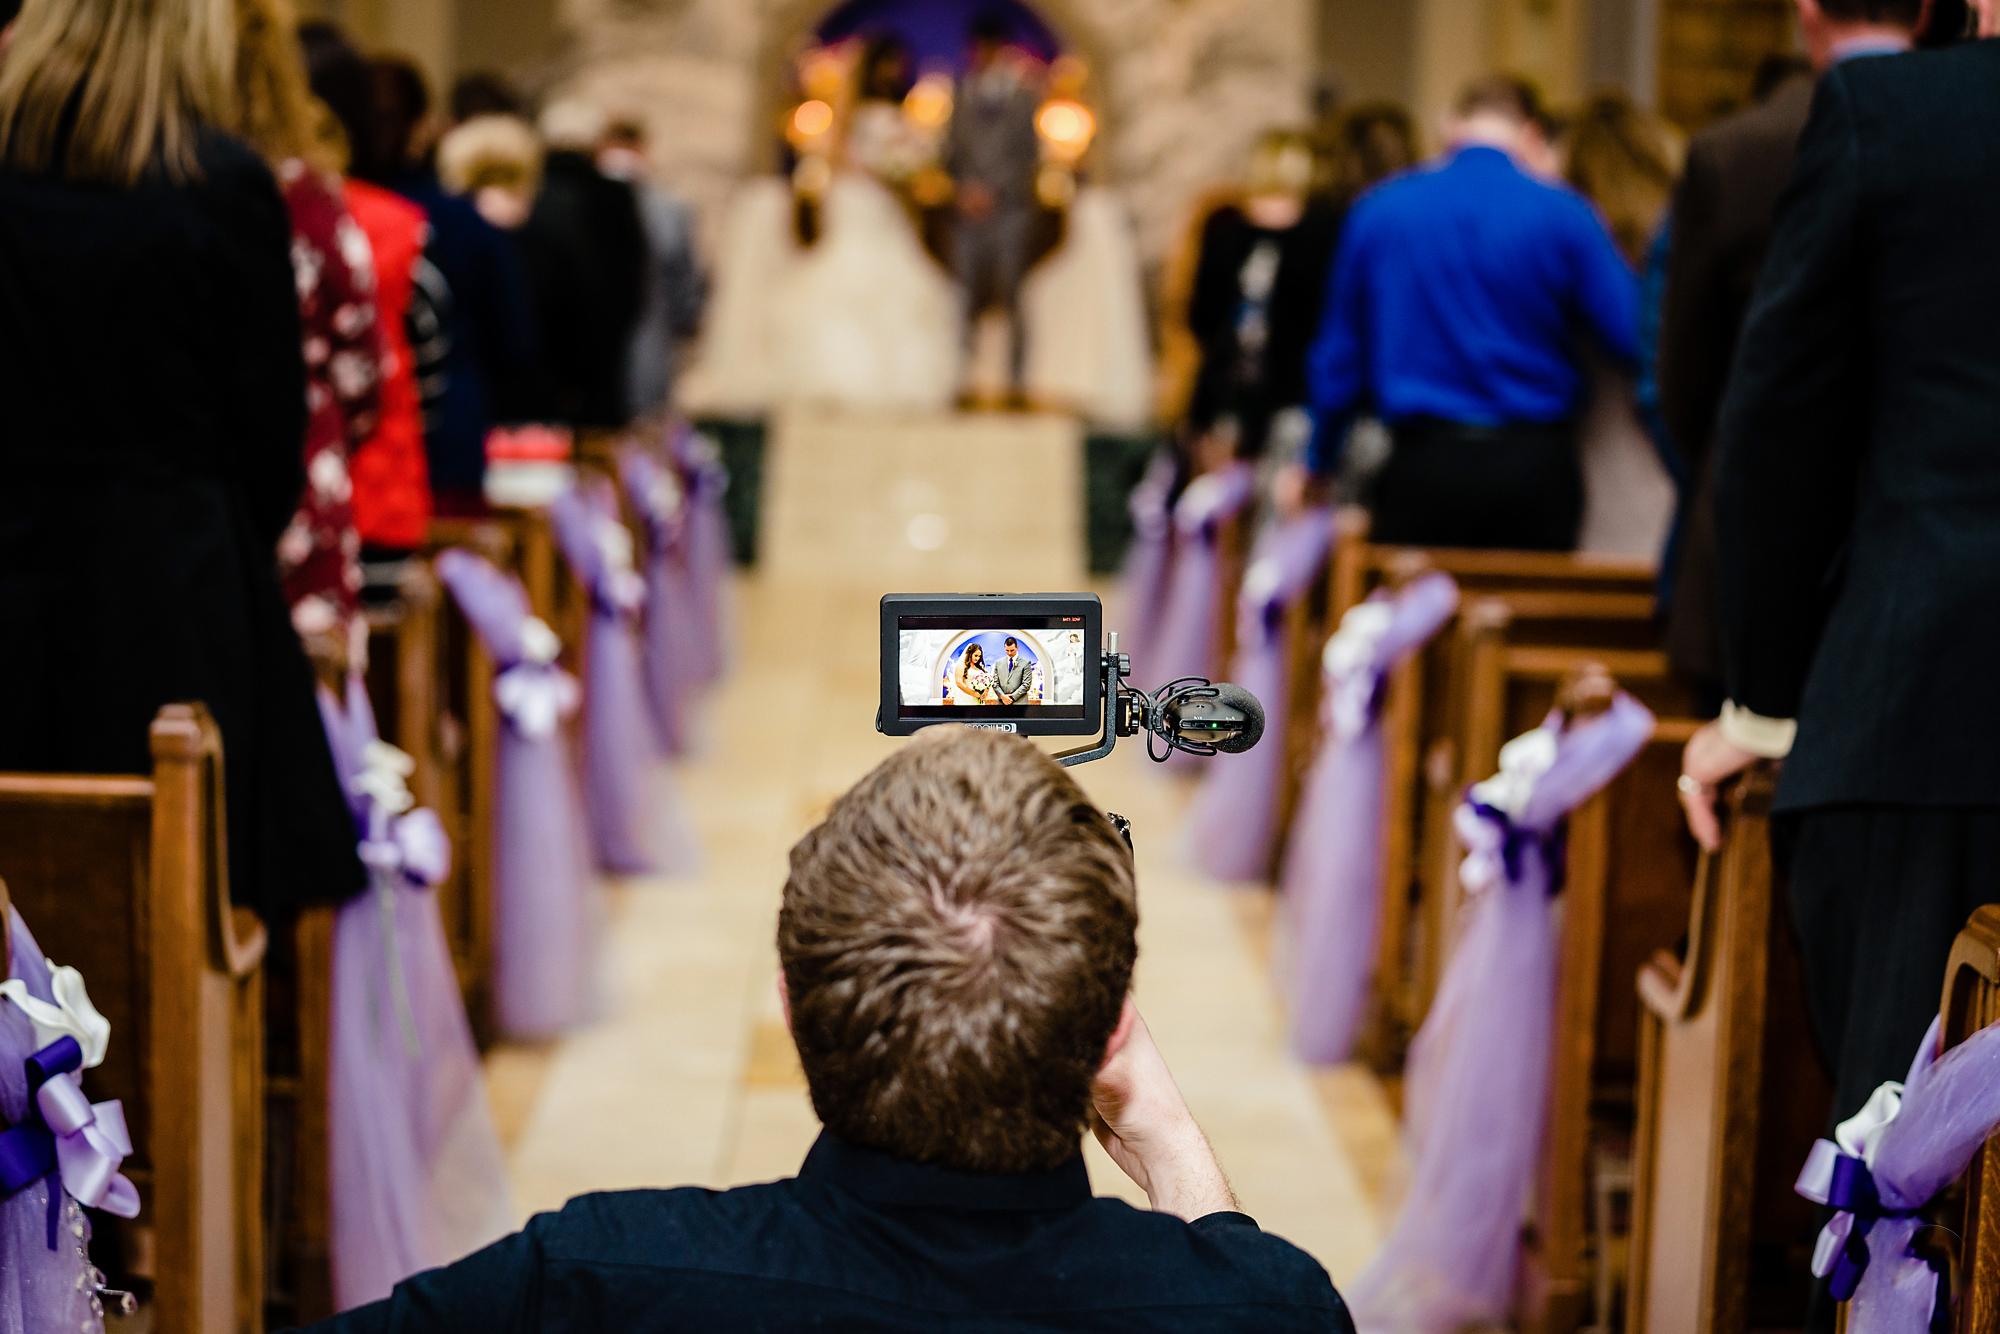 St-Henry-Catholic-Church-Erlanger-KY-Wedding-Photography-3.jpg